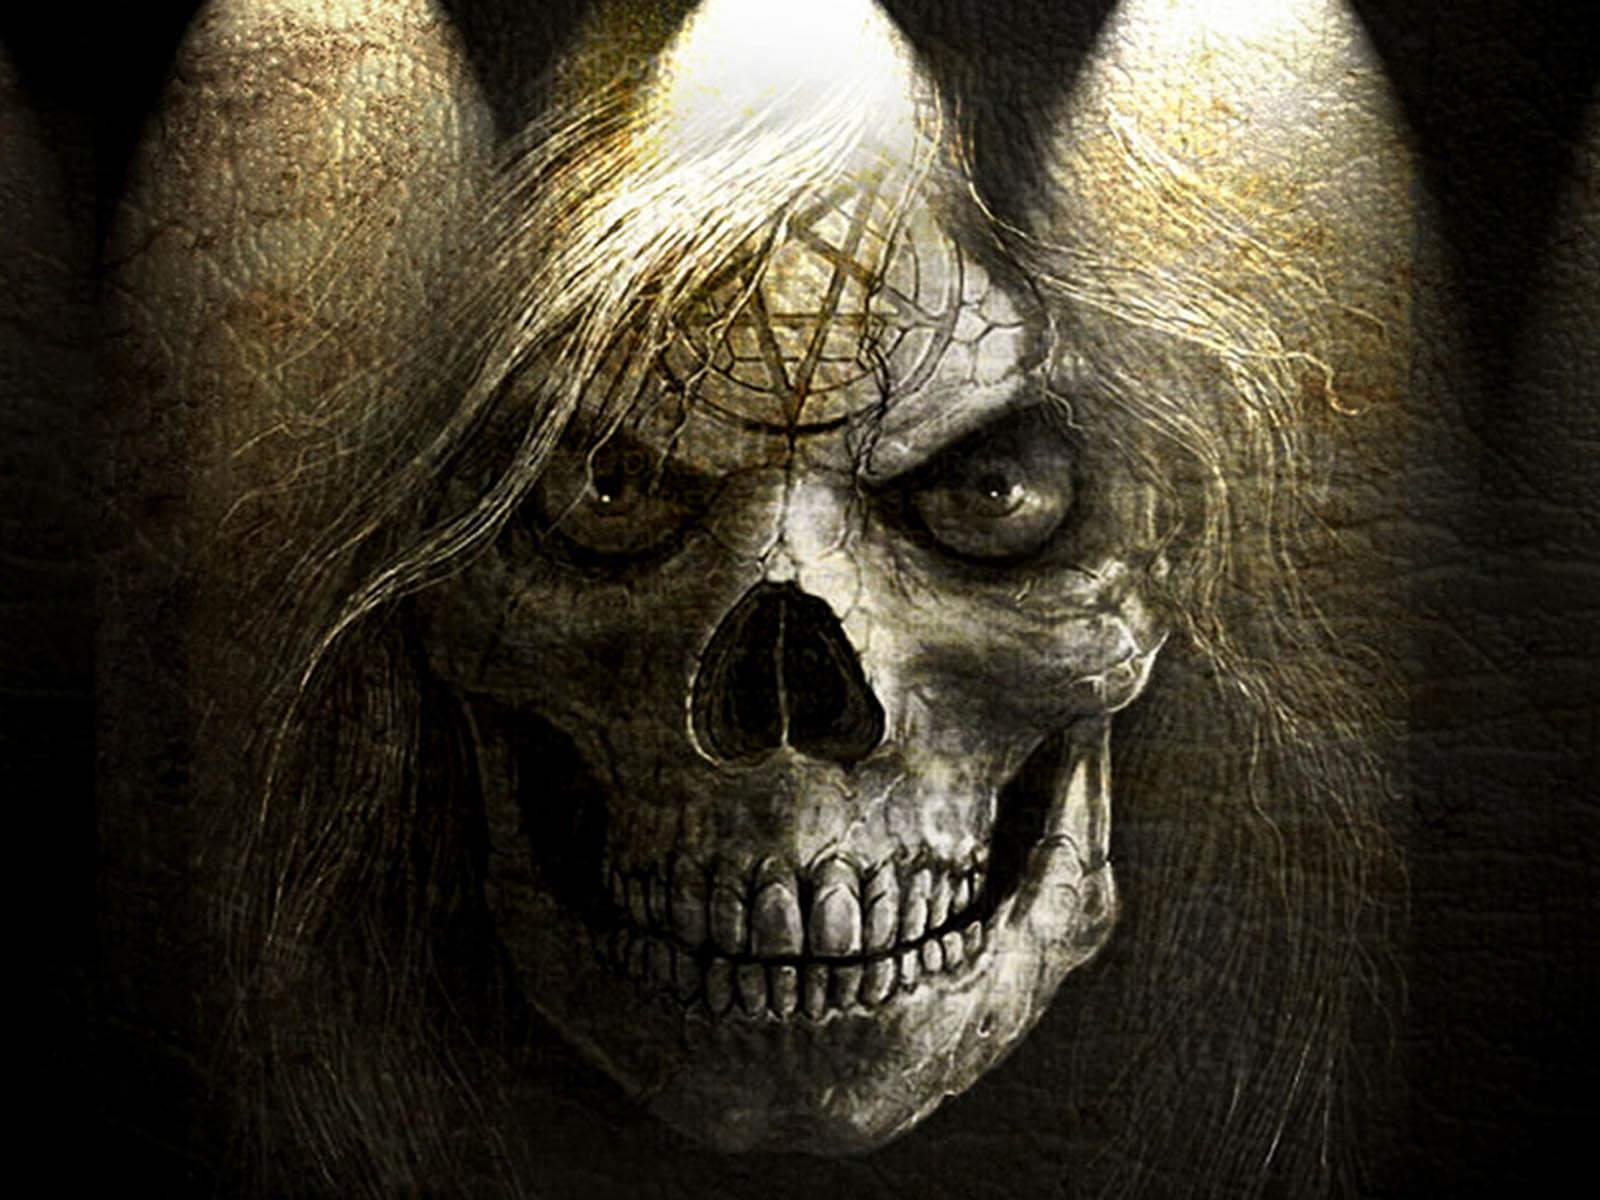 http://2.bp.blogspot.com/-Fk1XqxkuTXA/UE3ziTZ-ElI/AAAAAAAAJgw/h6lQawY8qZM/s1600/Horror%2BSkull%2BWallpapers%2B3.jpg